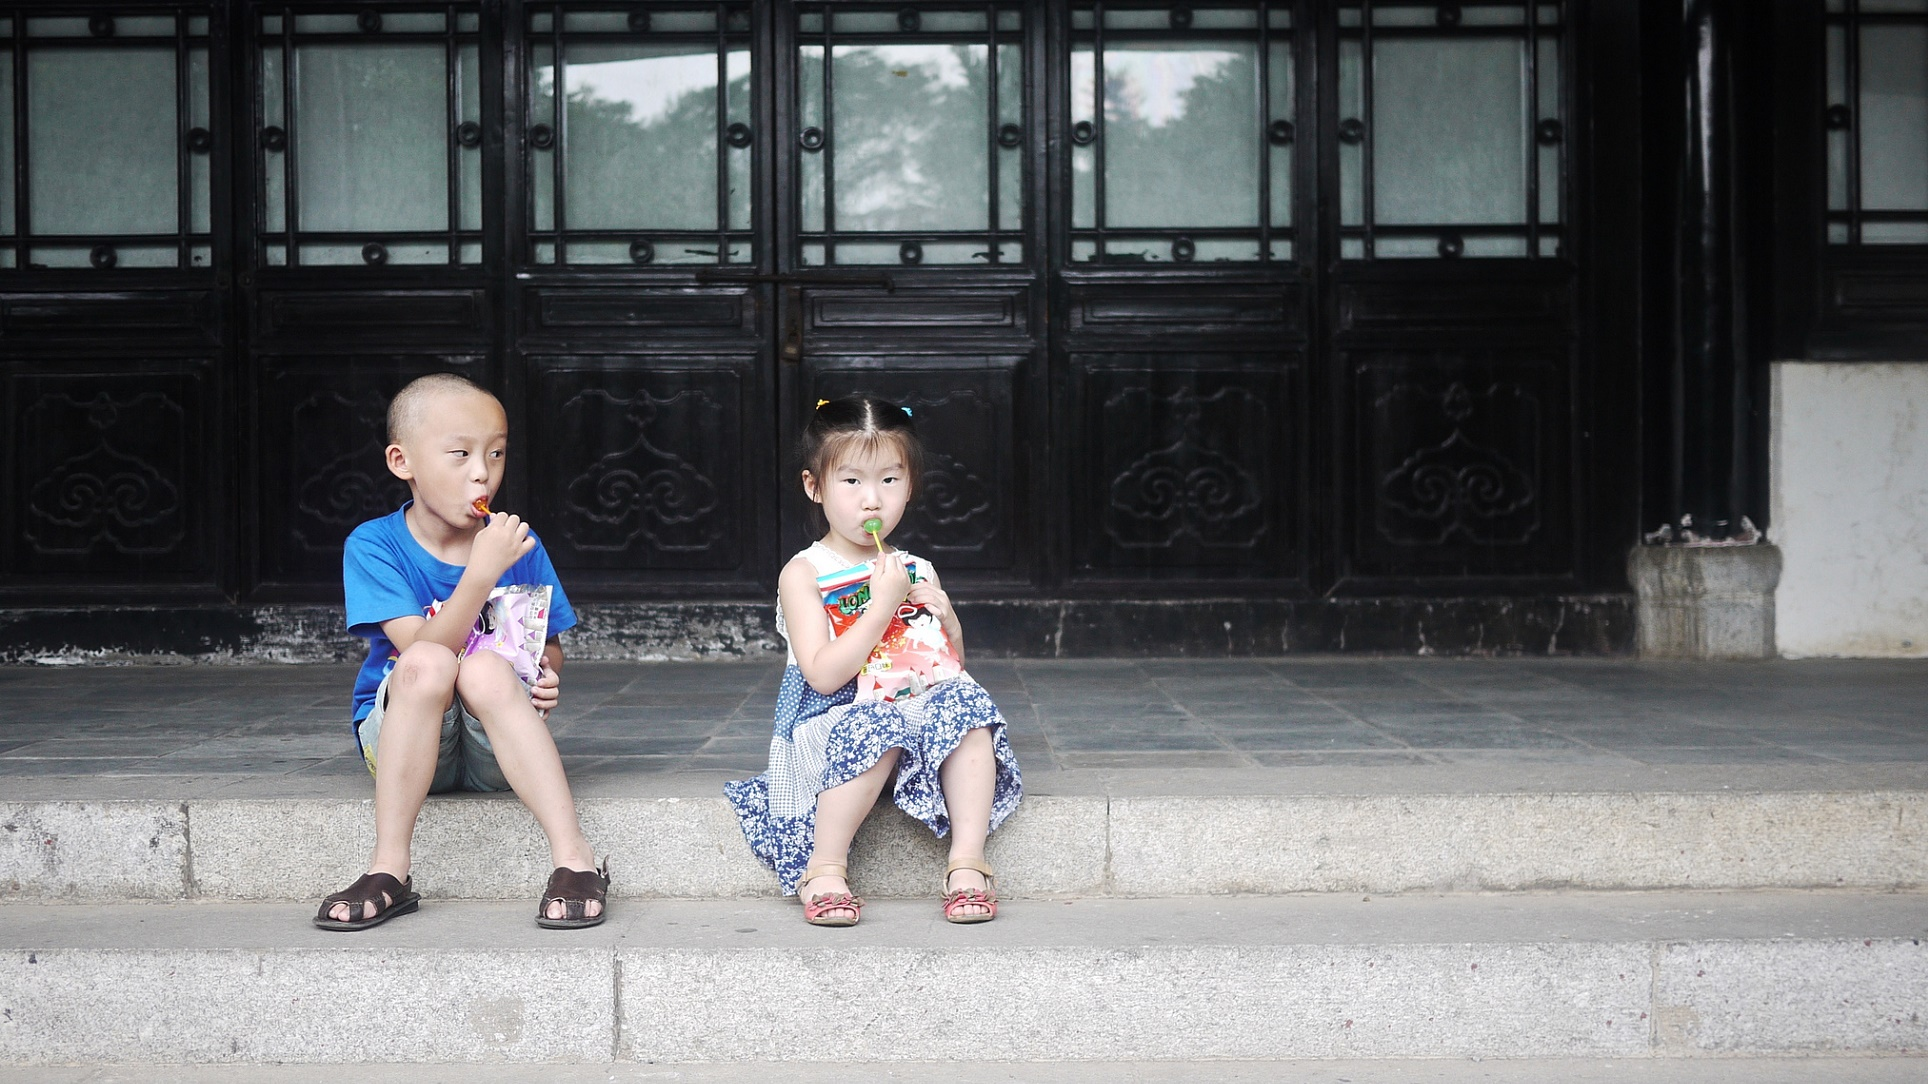 China busca favorecer la innovación enseñando a programar desde niños